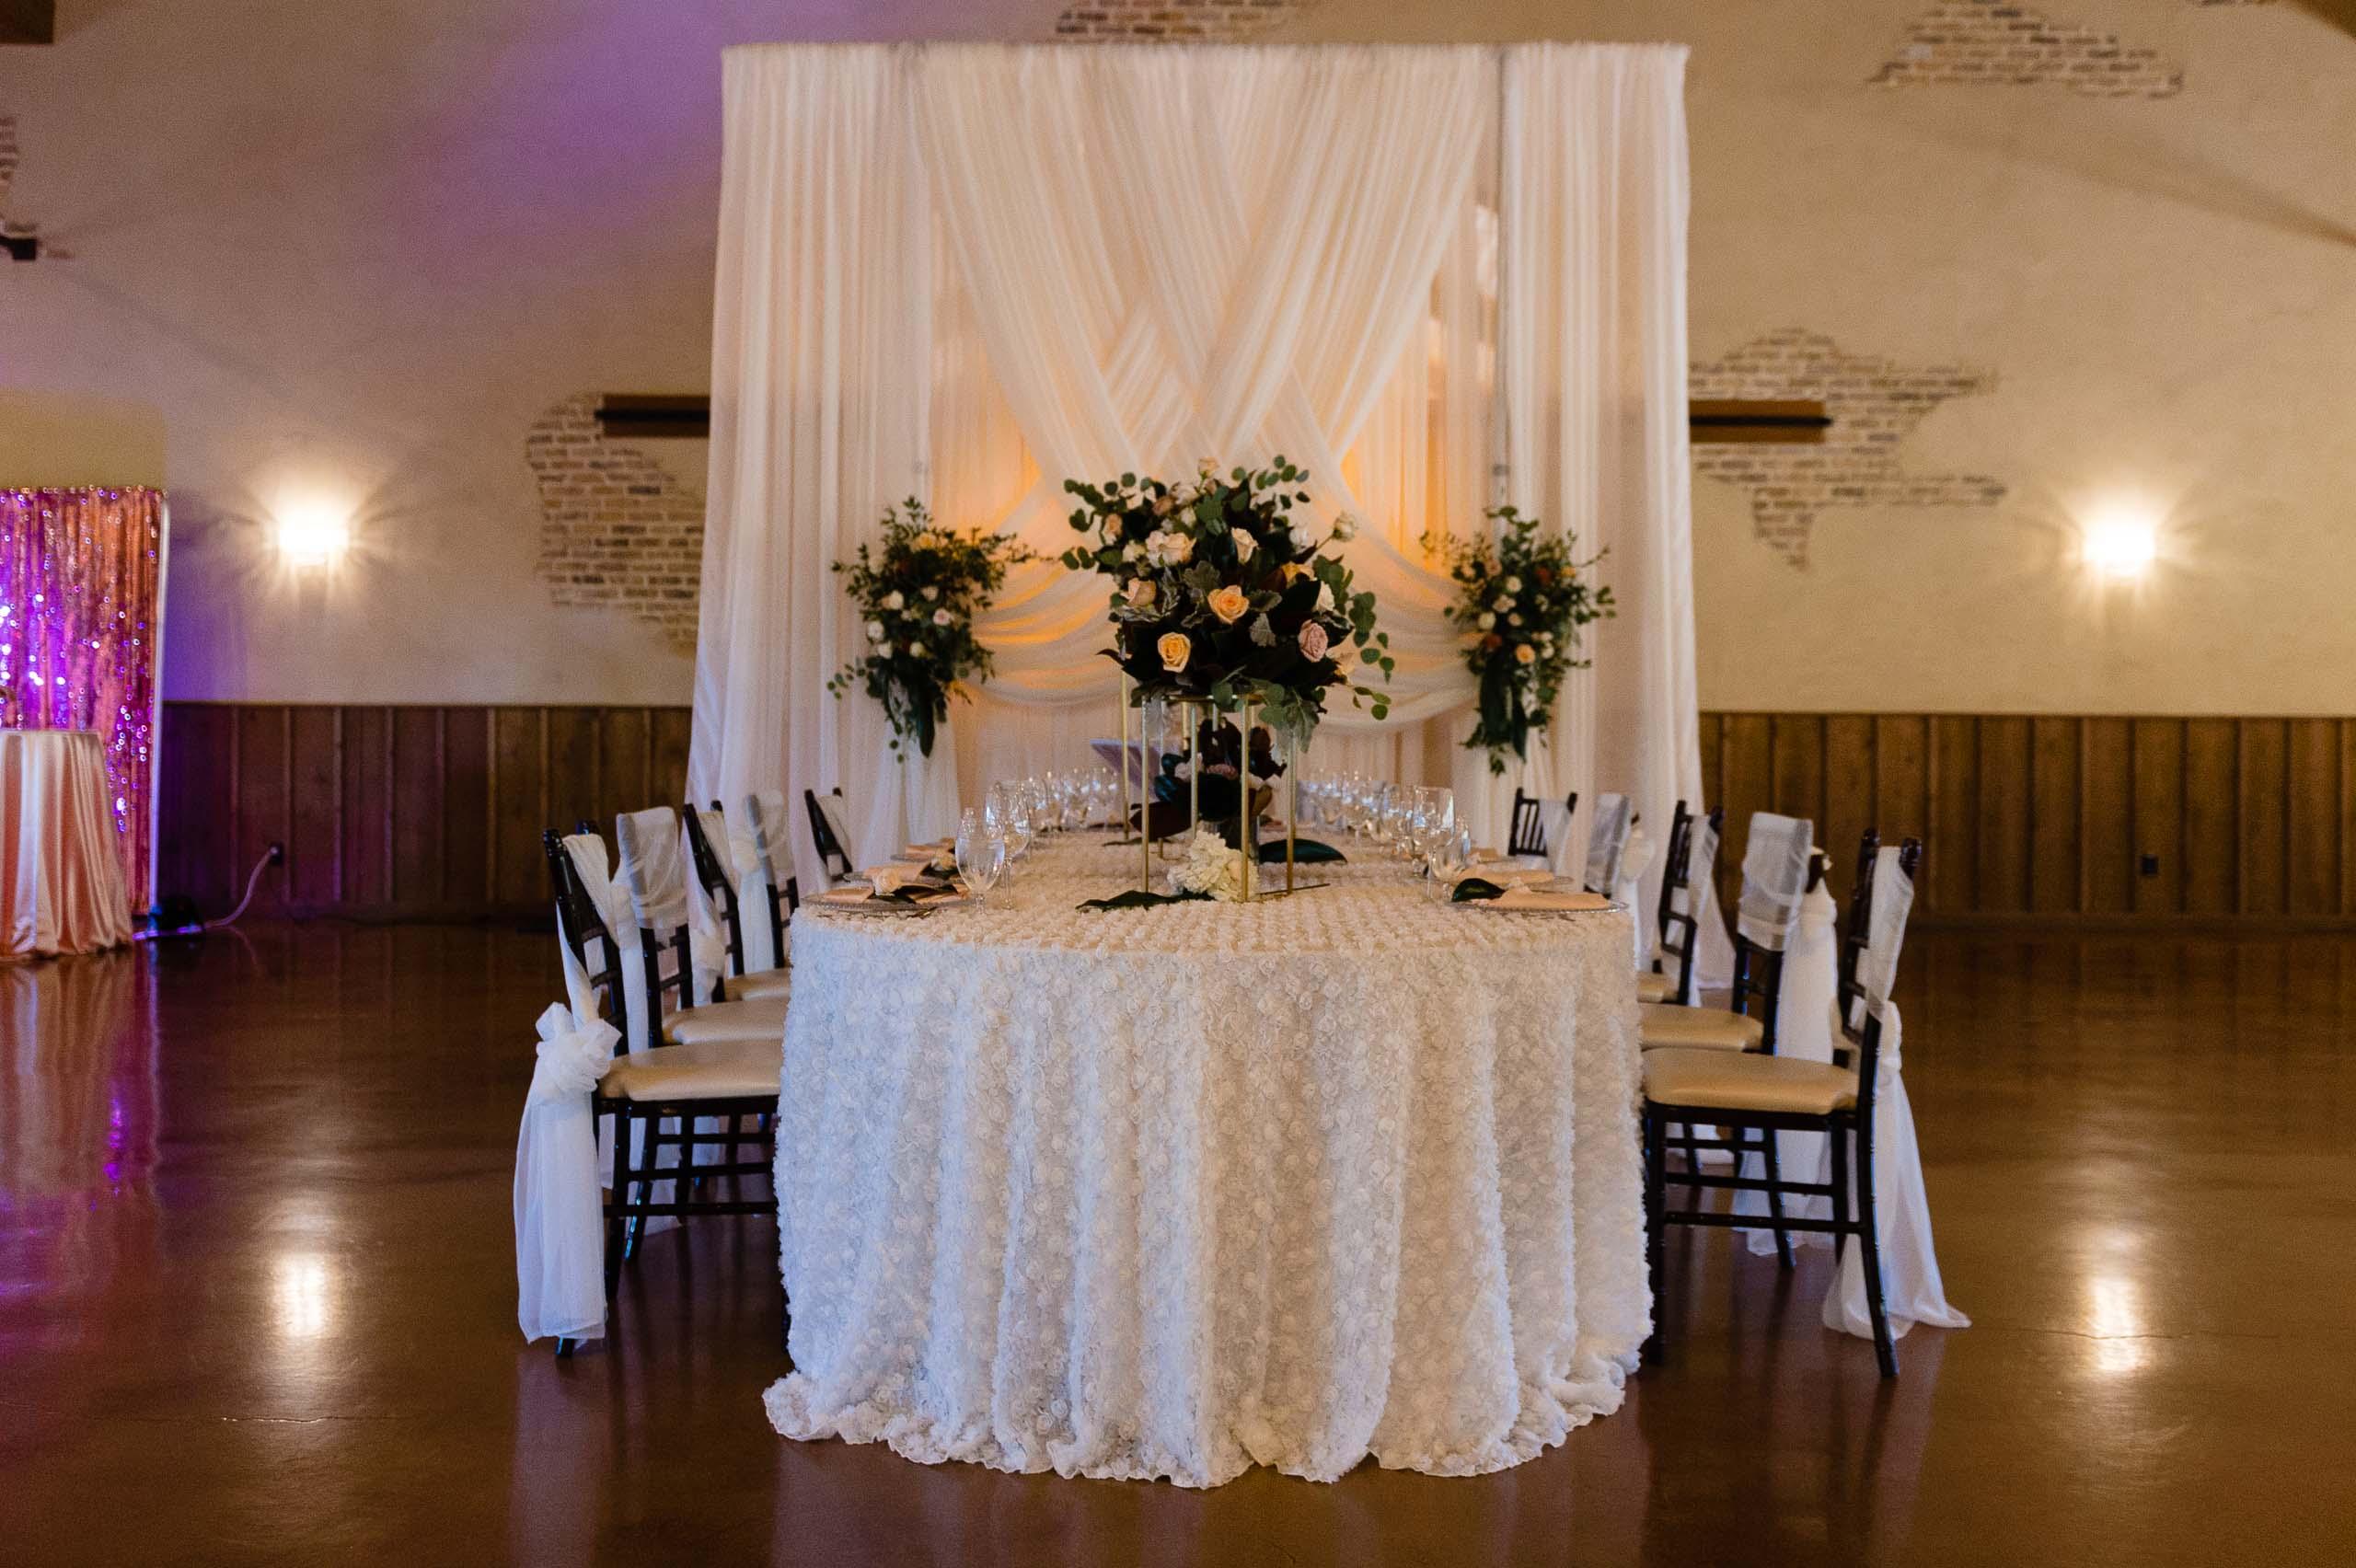 chandelier-of-gruene-winter-wedding-inspiration-_4S27989